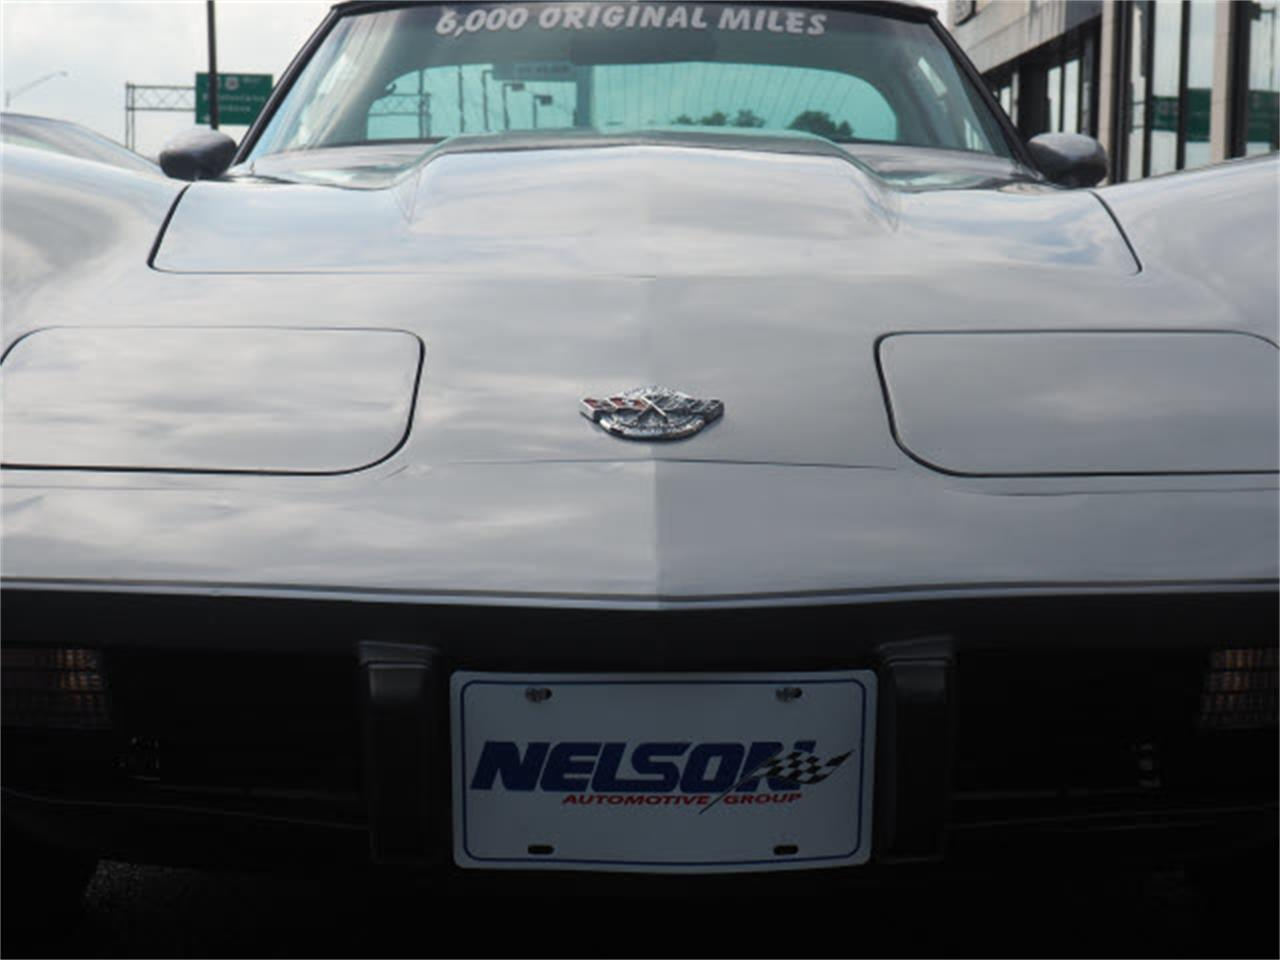 Large Picture of 1978 Chevrolet Corvette located in Marysville Ohio - $22,999.00 - NMOD